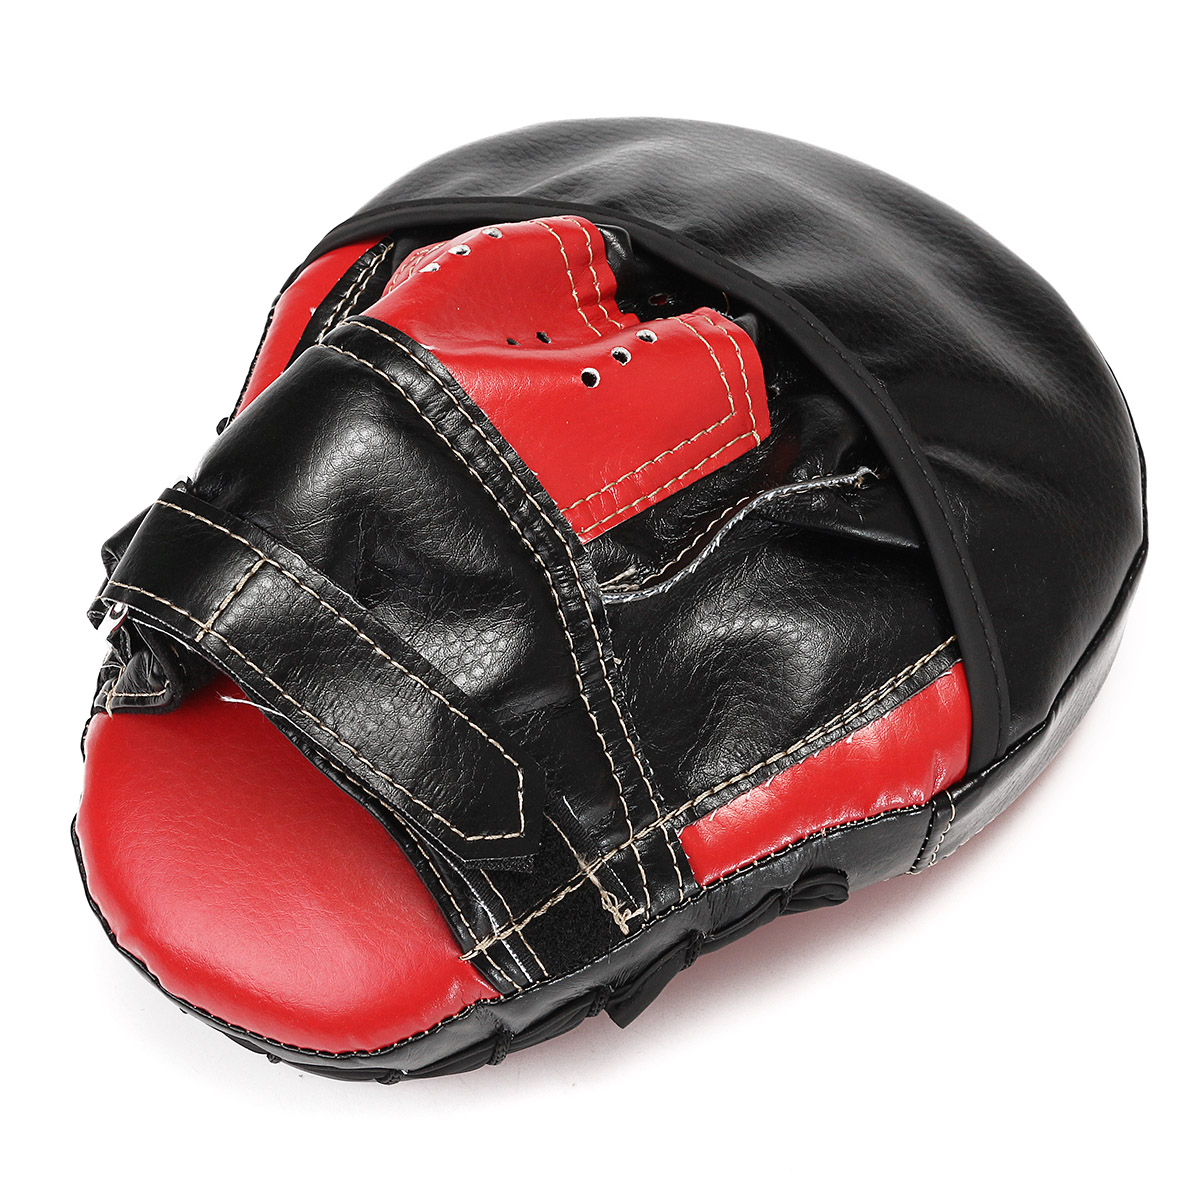 Ai Home Mma Boxing Mitt Focus Punch Pad Training Glove Karate Muay Rka Punching Target Pukulan Tinju 2 Pu Leather For